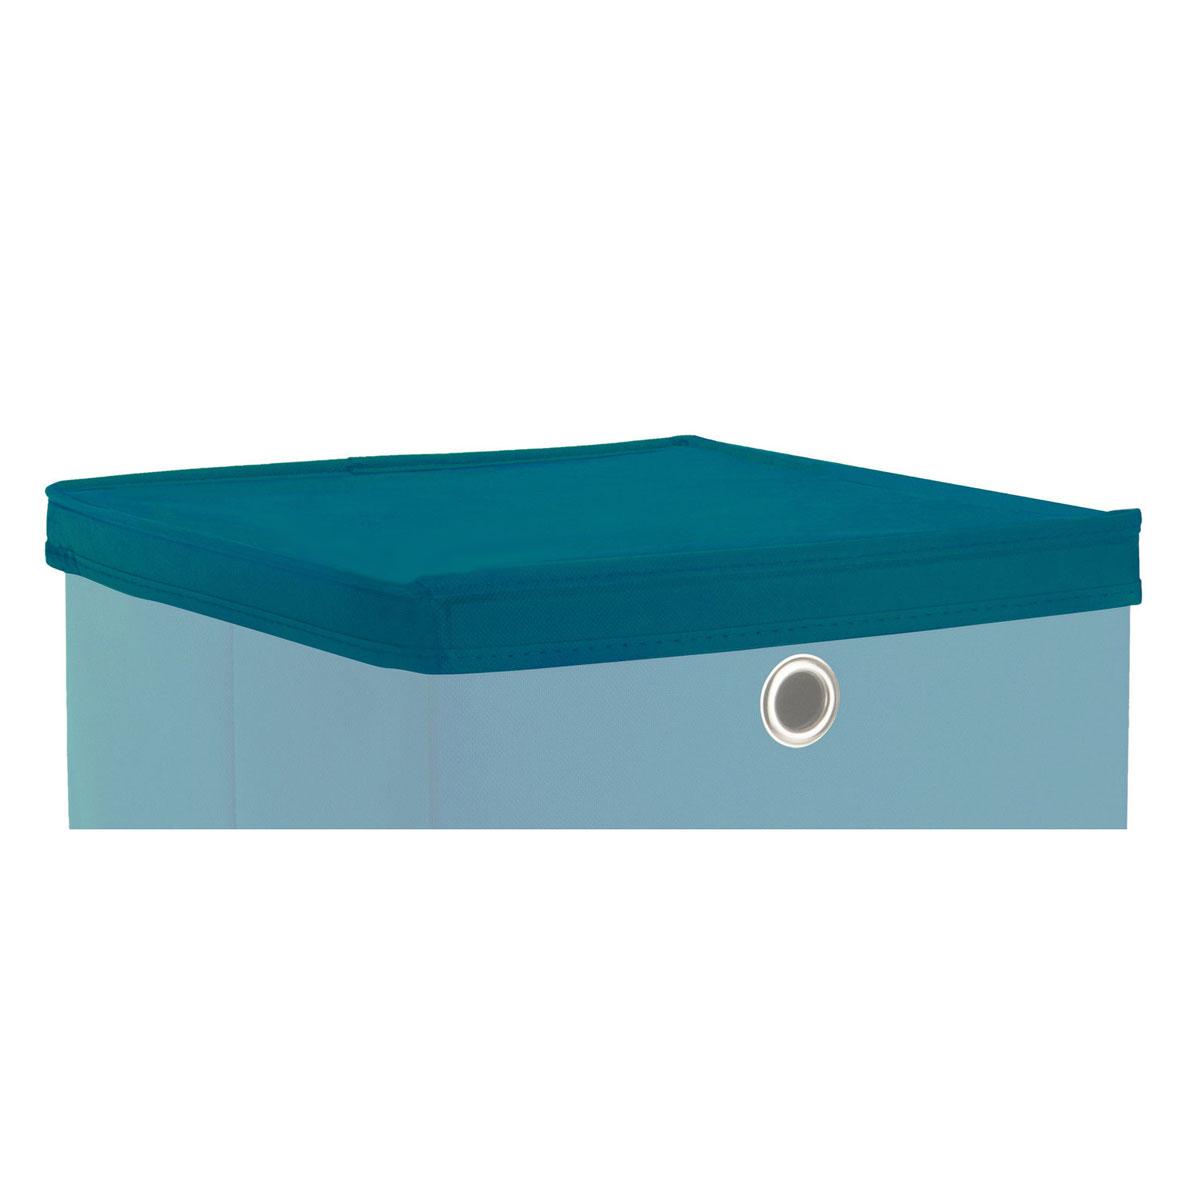 faltbox deckel kubus f r boxen mit 32x32 cm petrol f r. Black Bedroom Furniture Sets. Home Design Ideas